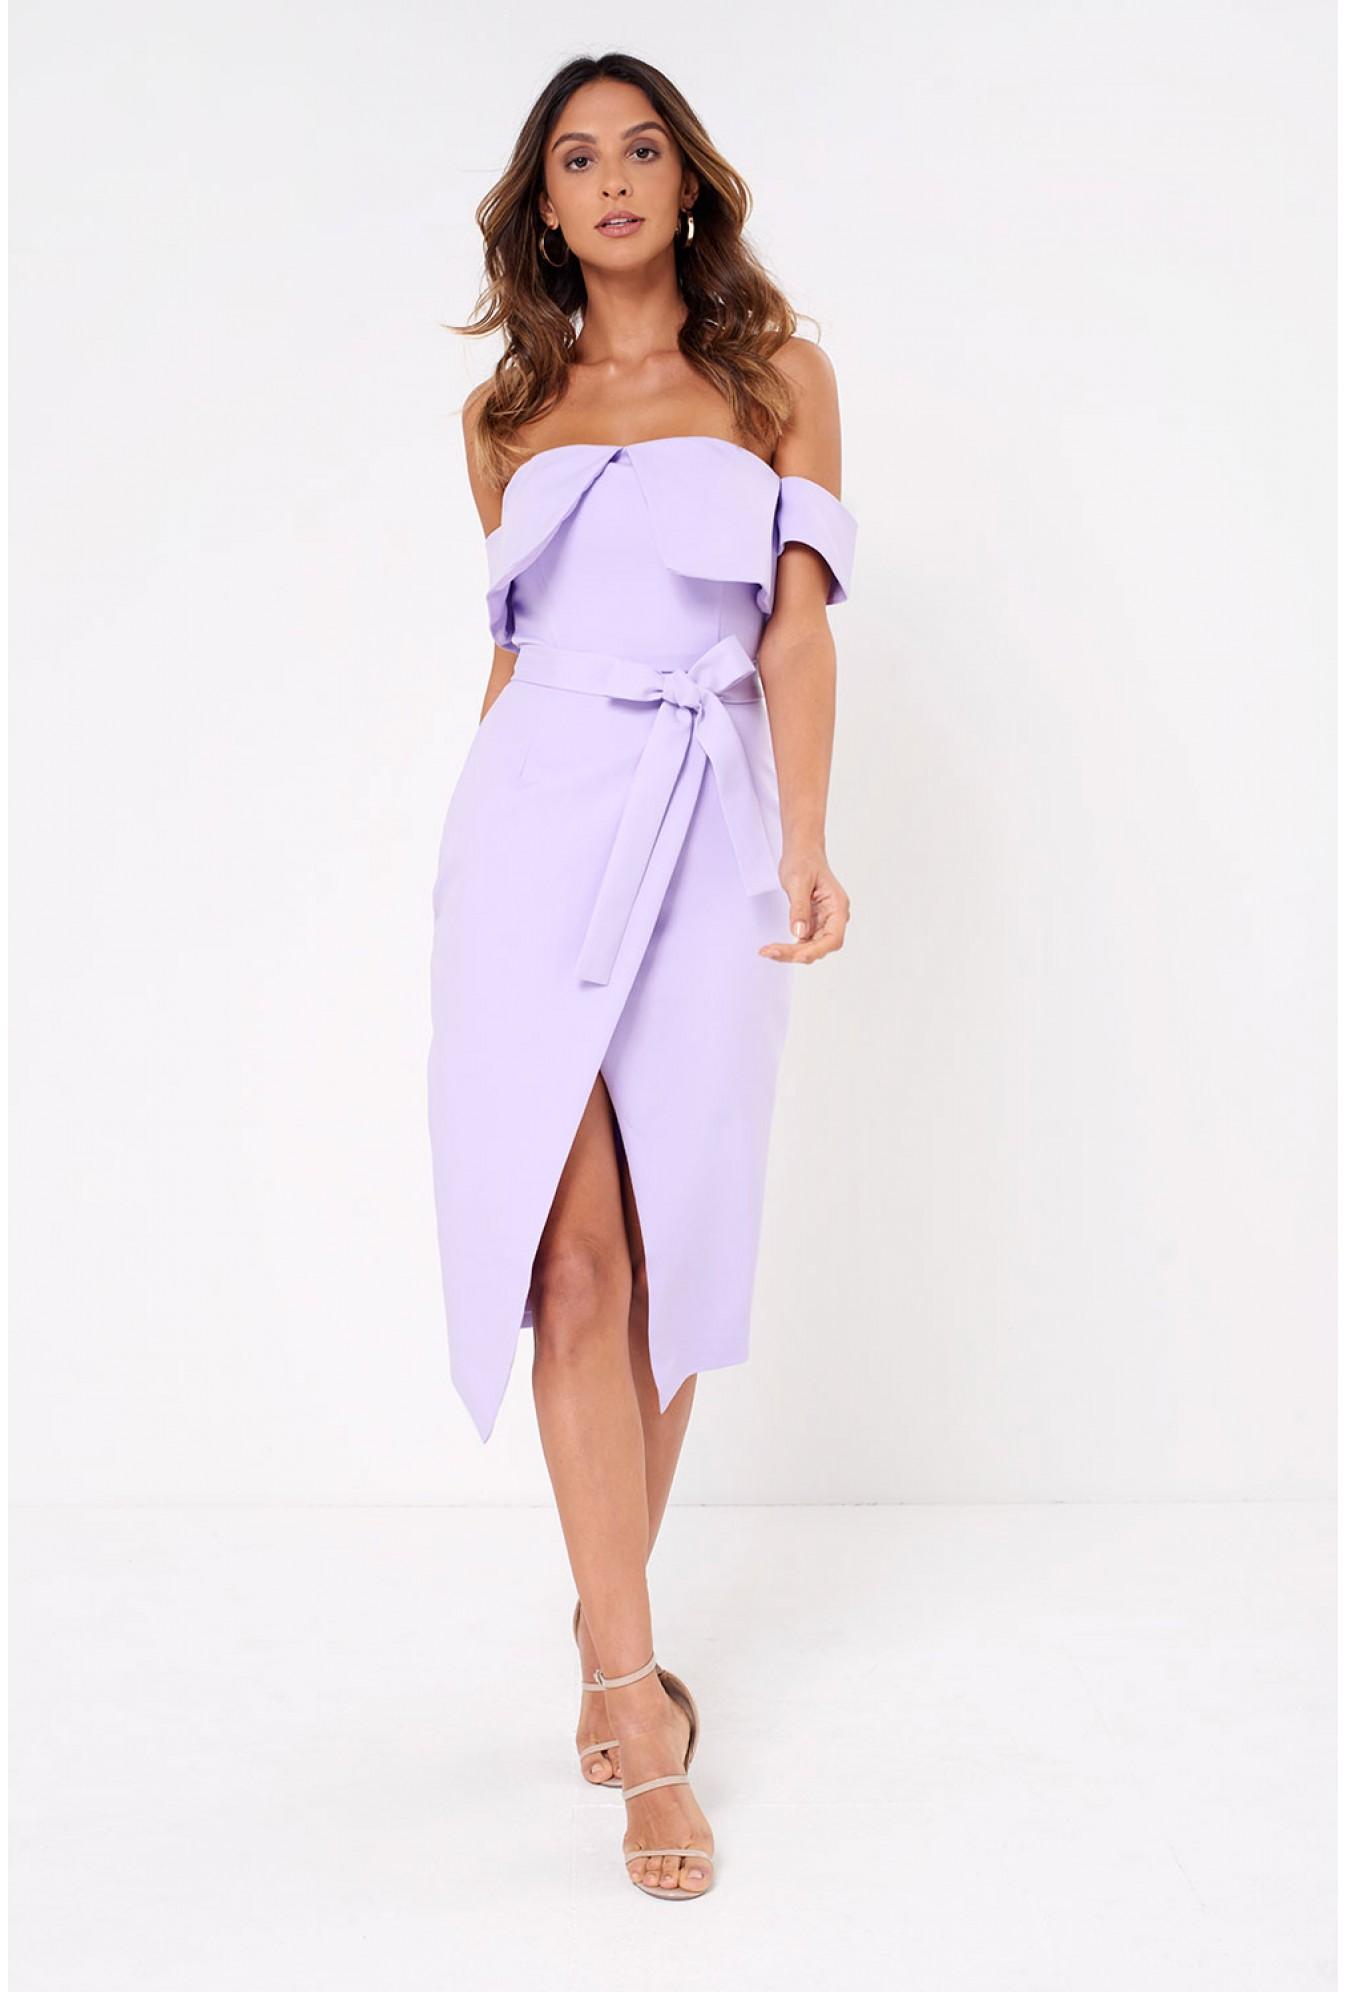 a237216d0d Soho Market Lavish Alice Bardot Wrap Midi Dress in Lilac